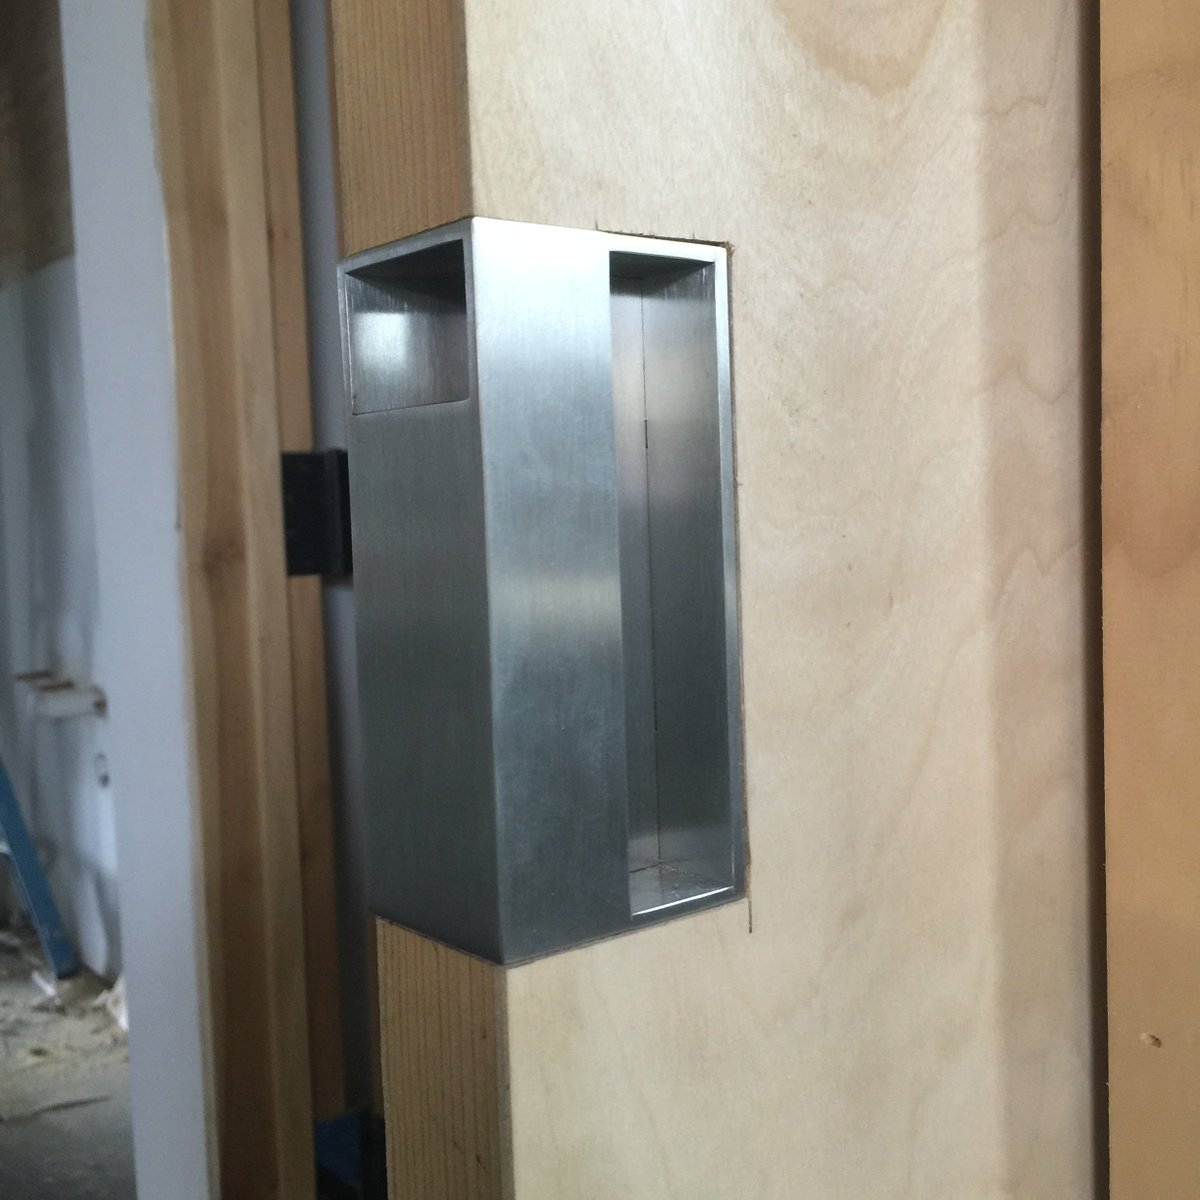 How to install pocket door pull - 9 25 Am 22 Feb 2016